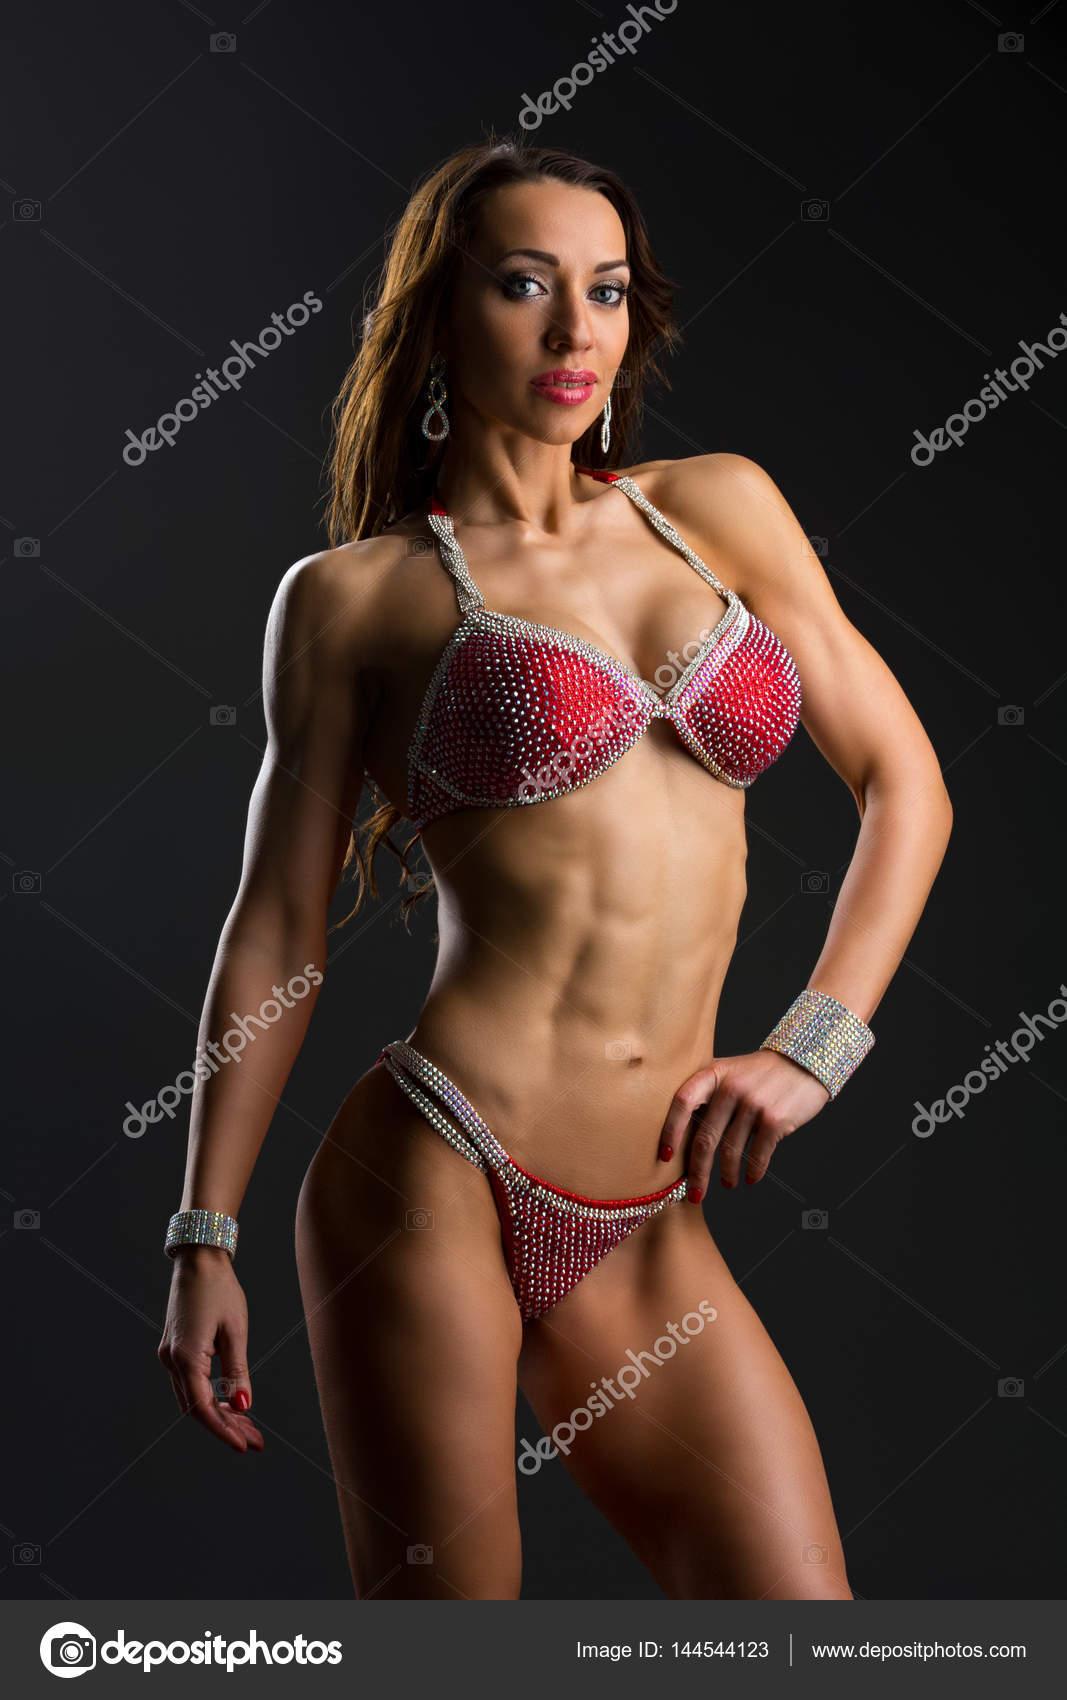 Русские фитнес красотки в бикини эротика